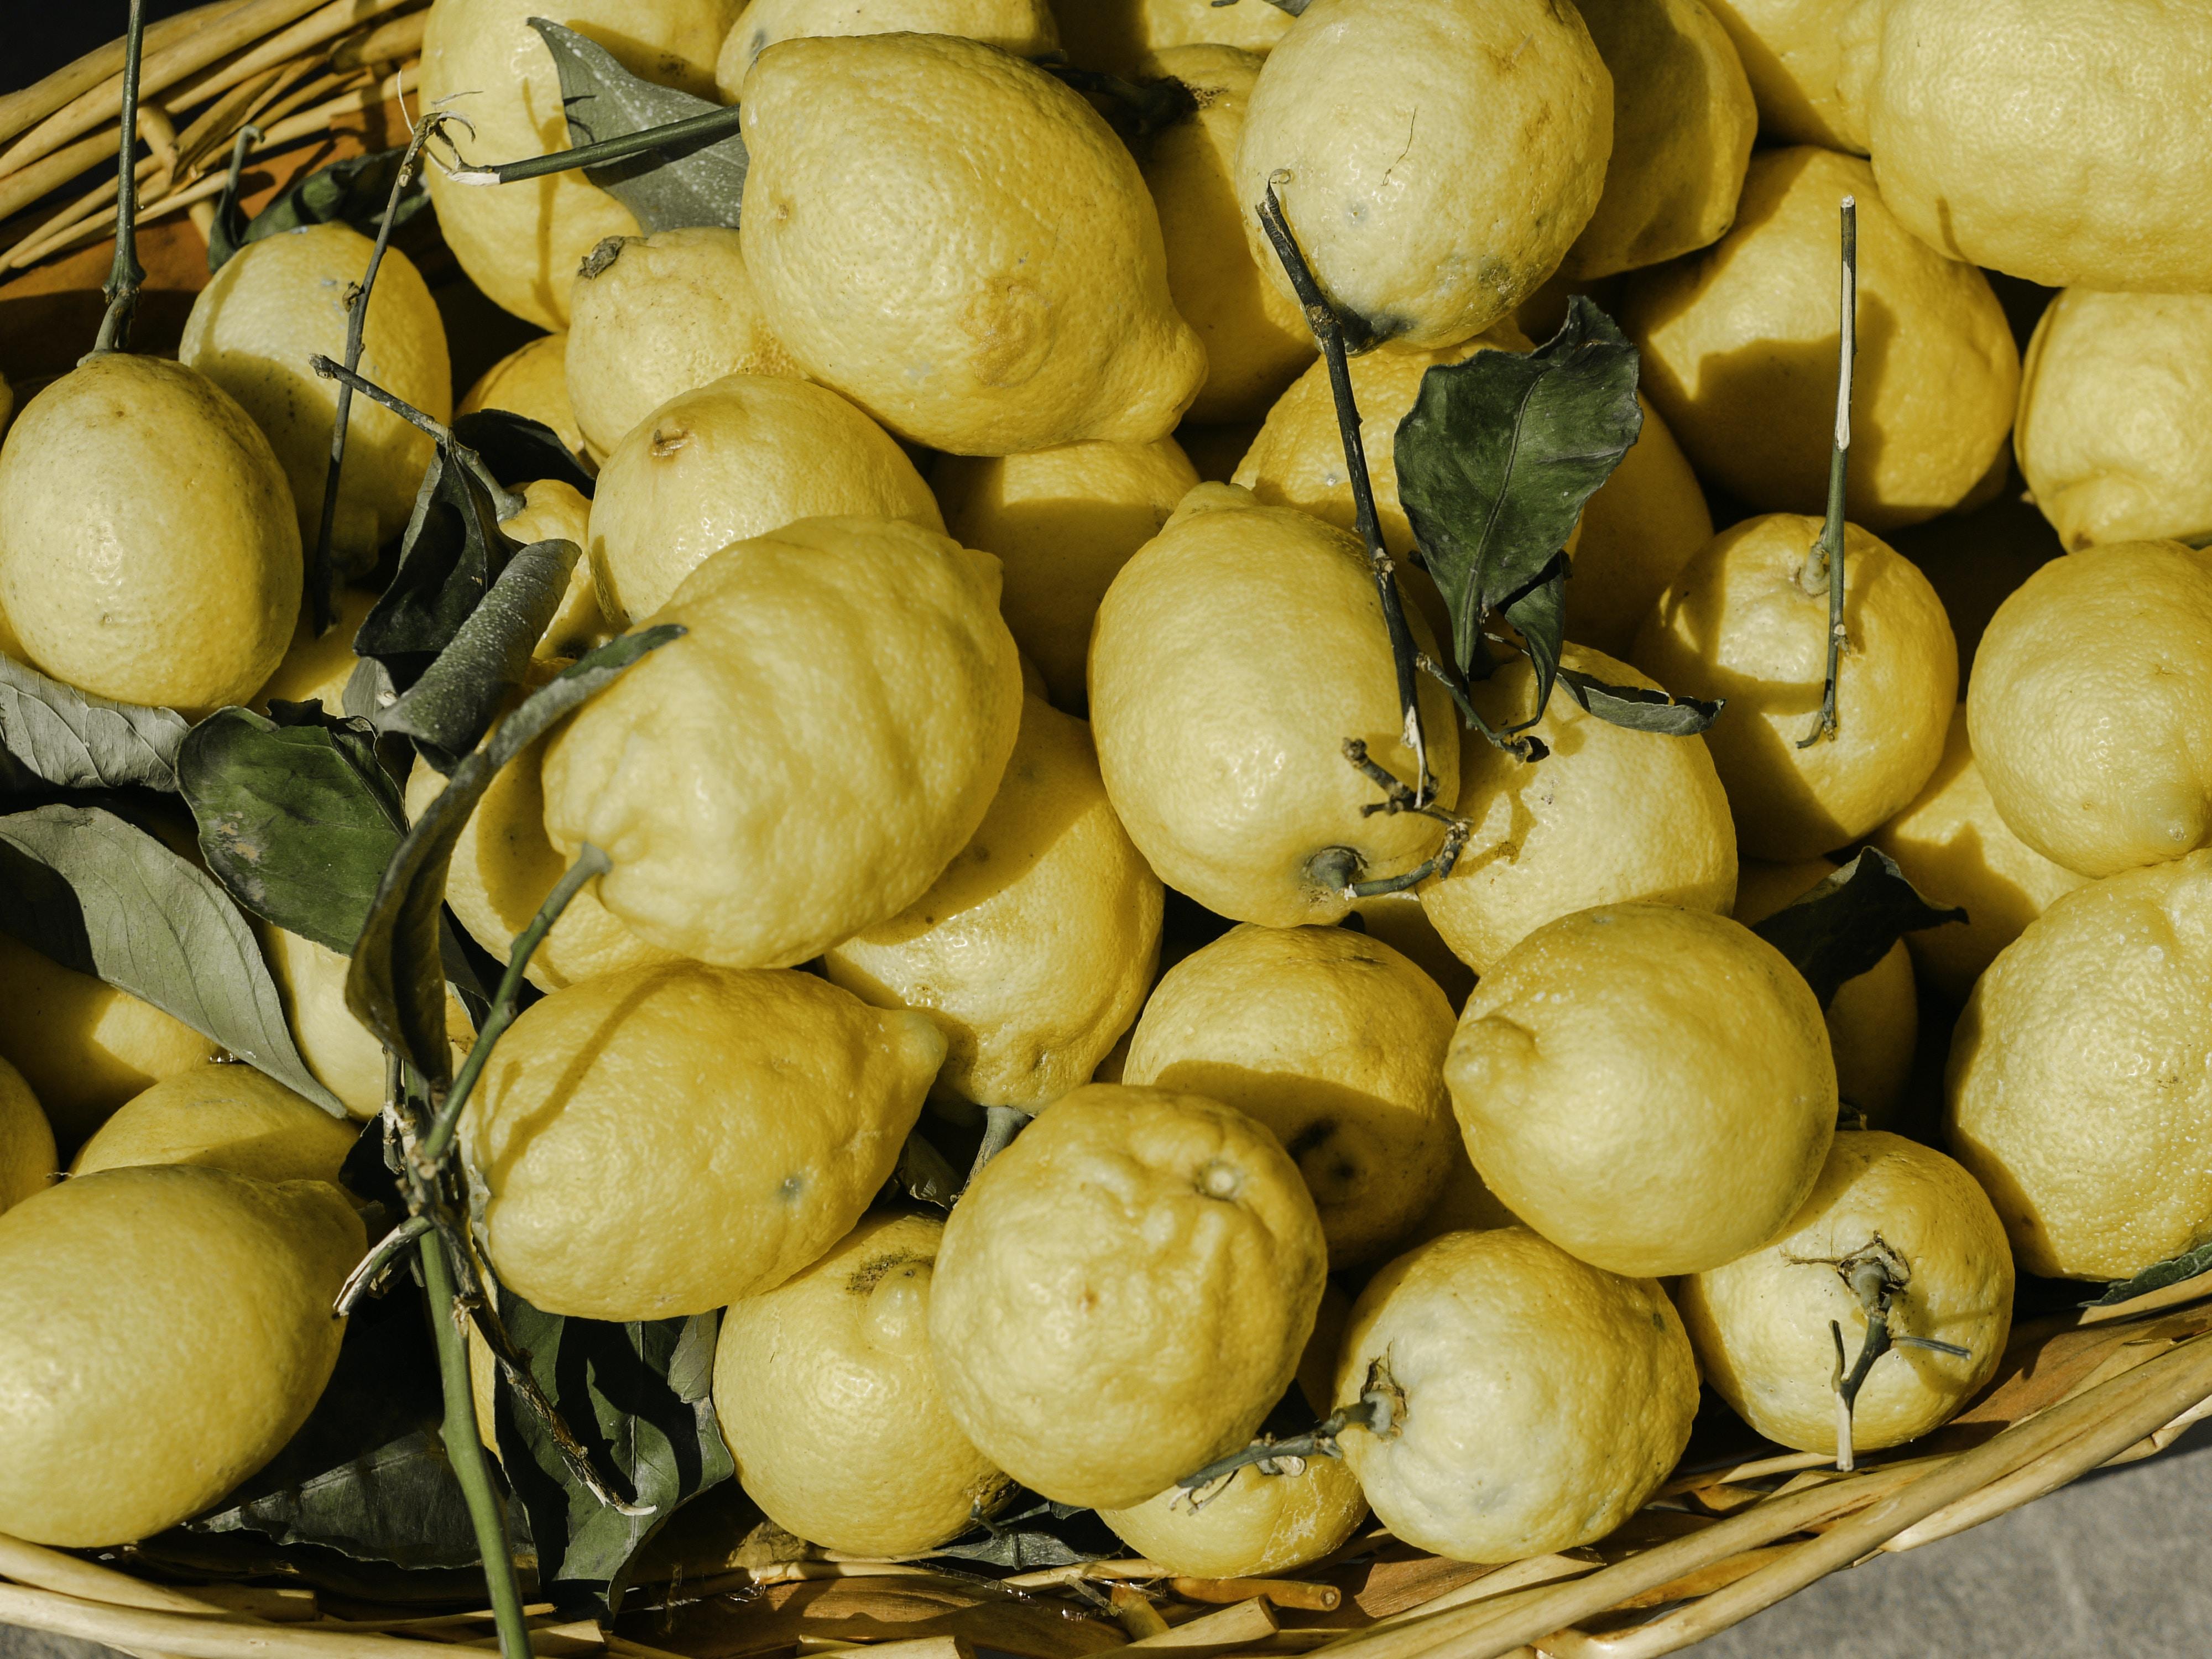 yellow fruits on brown basket